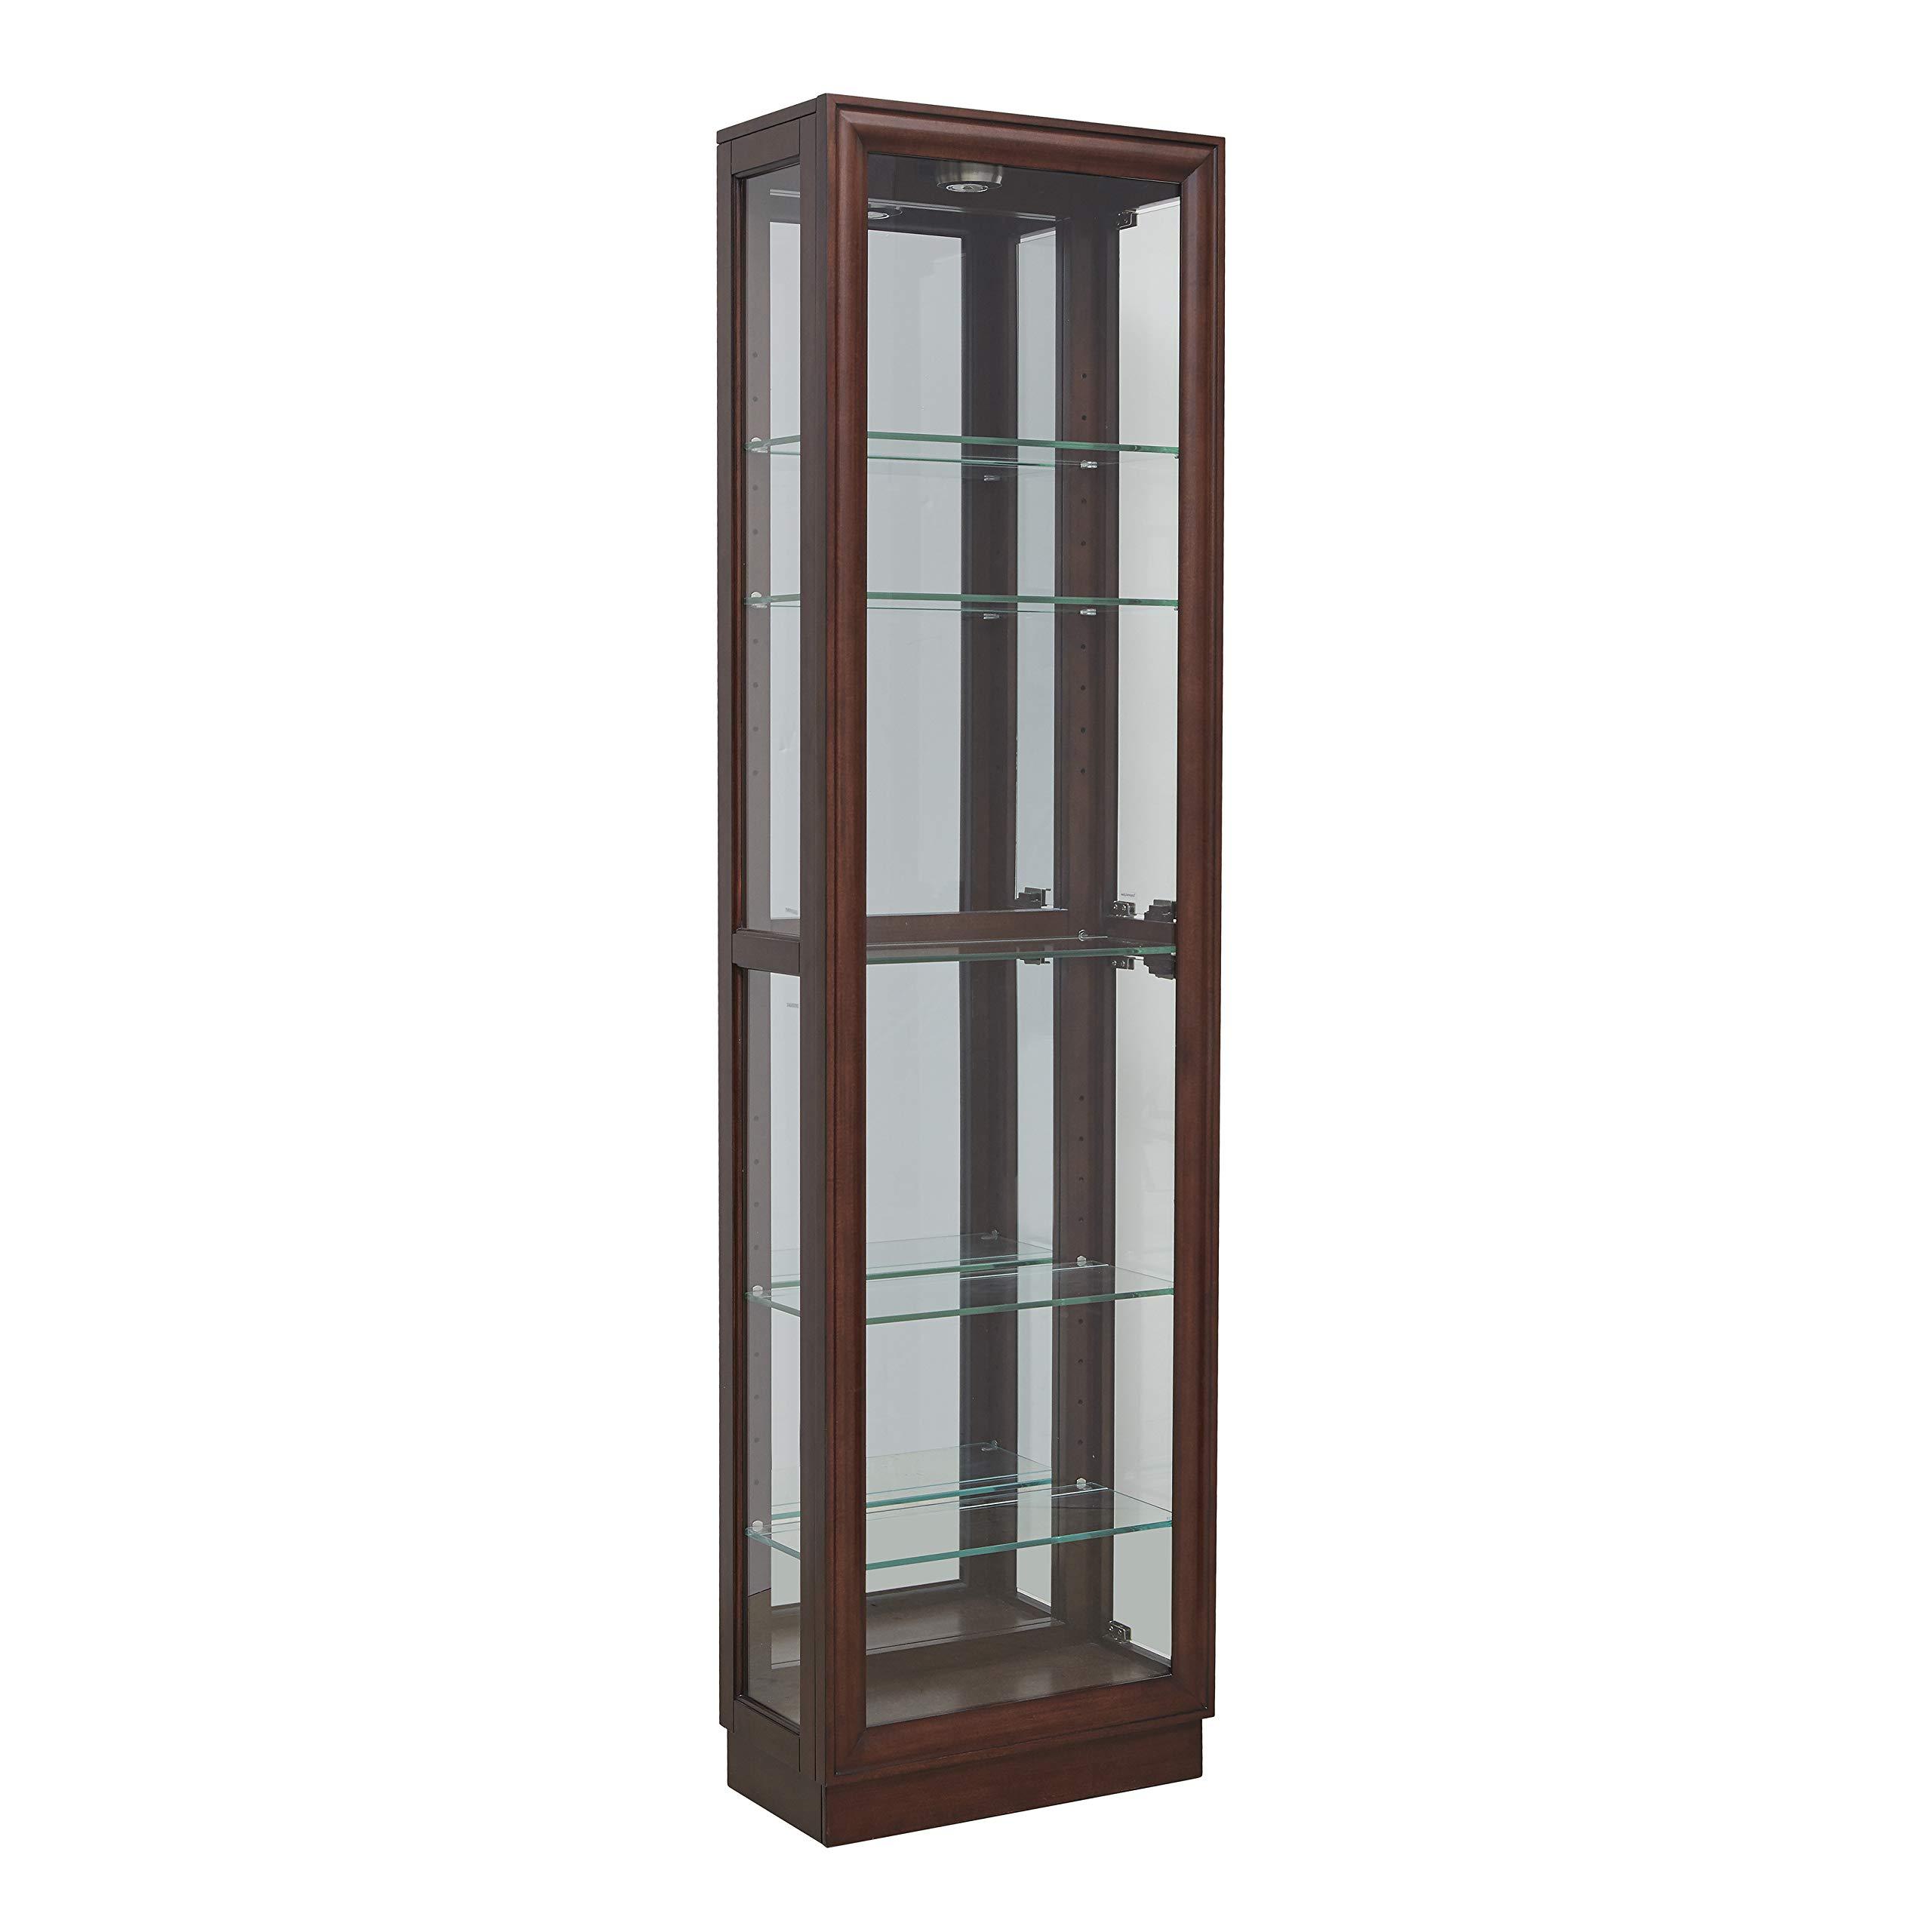 Pulaski  Side Entry Curio Display Cabinet, 21.0'' L x 11.0'' W x 77.0'' H, Cherry by Pulaski (Image #1)